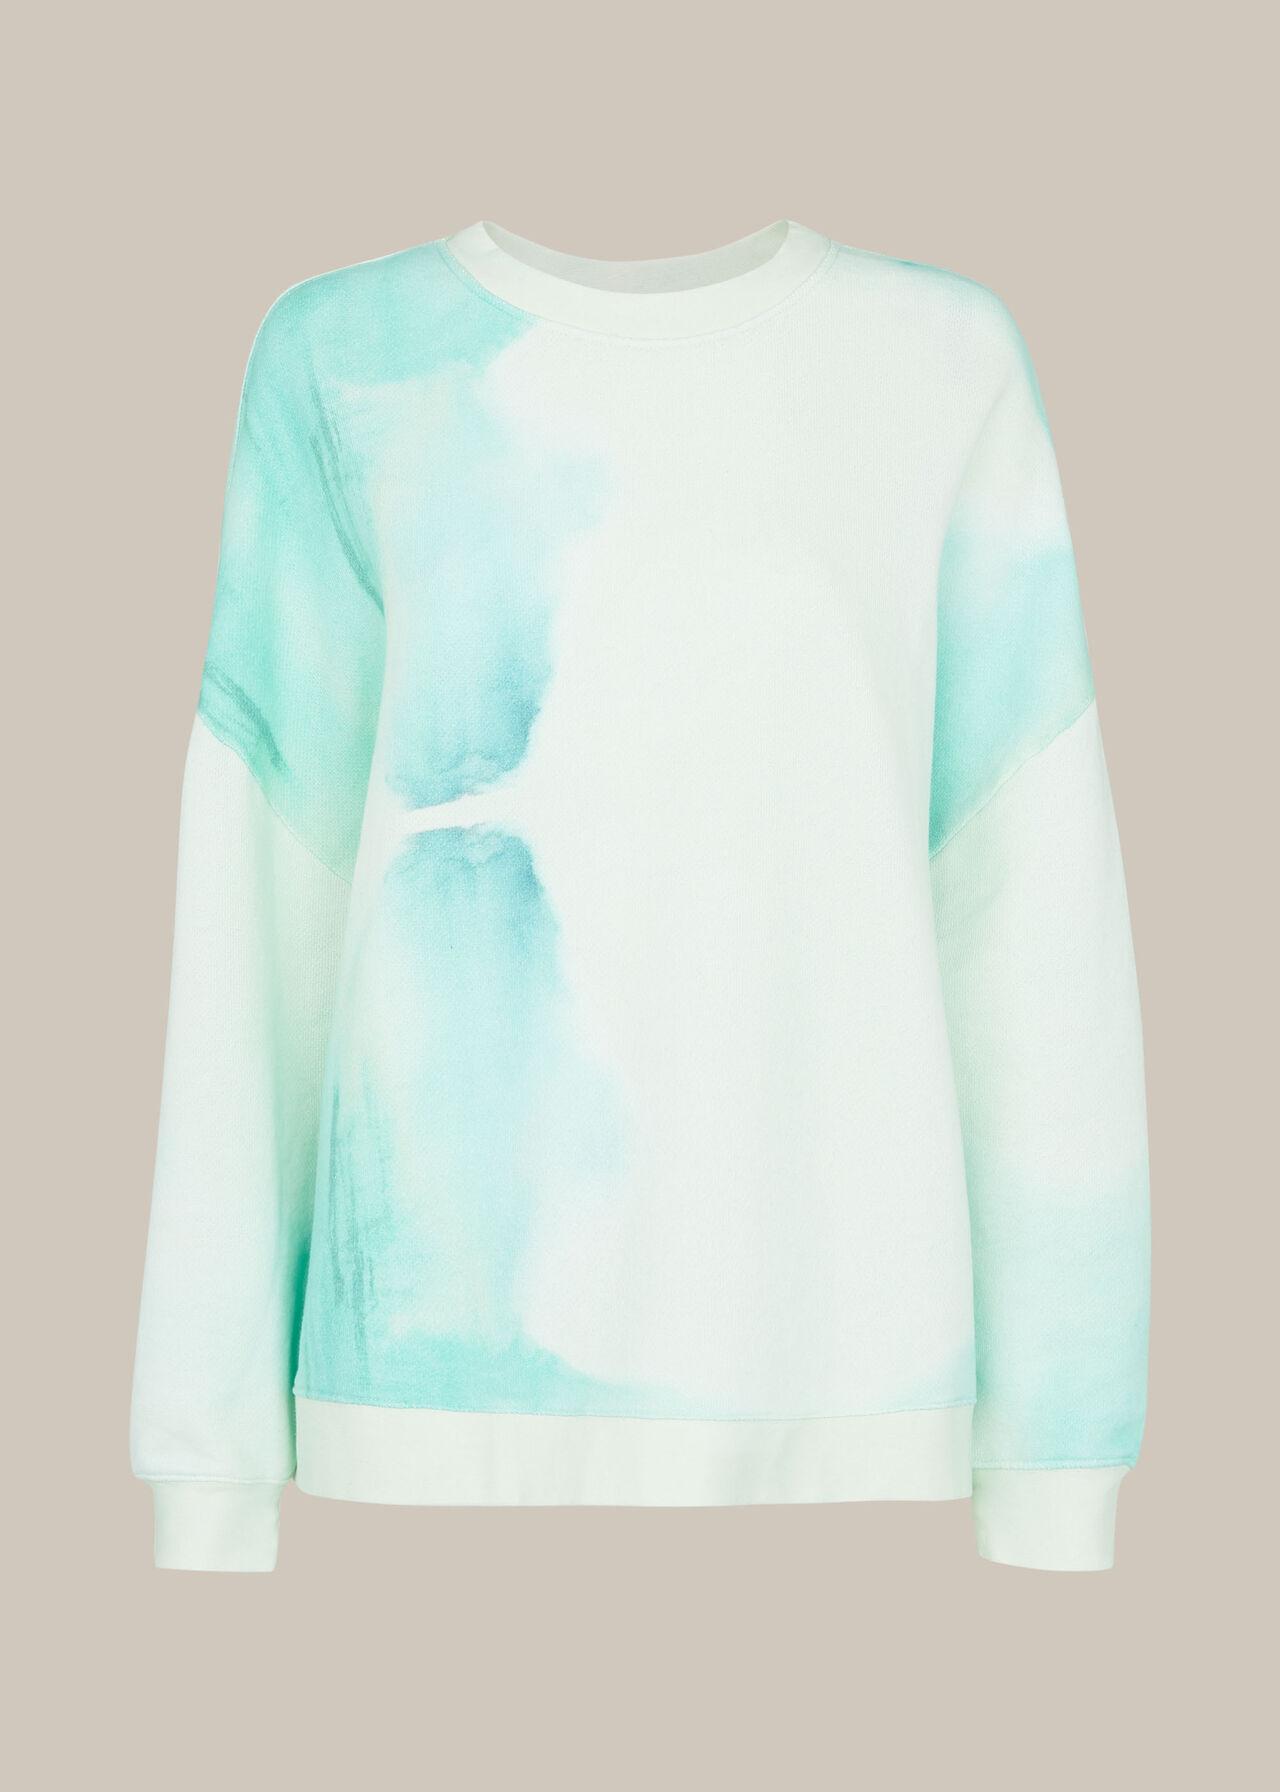 Tie Dye Cotton Sweatshirt